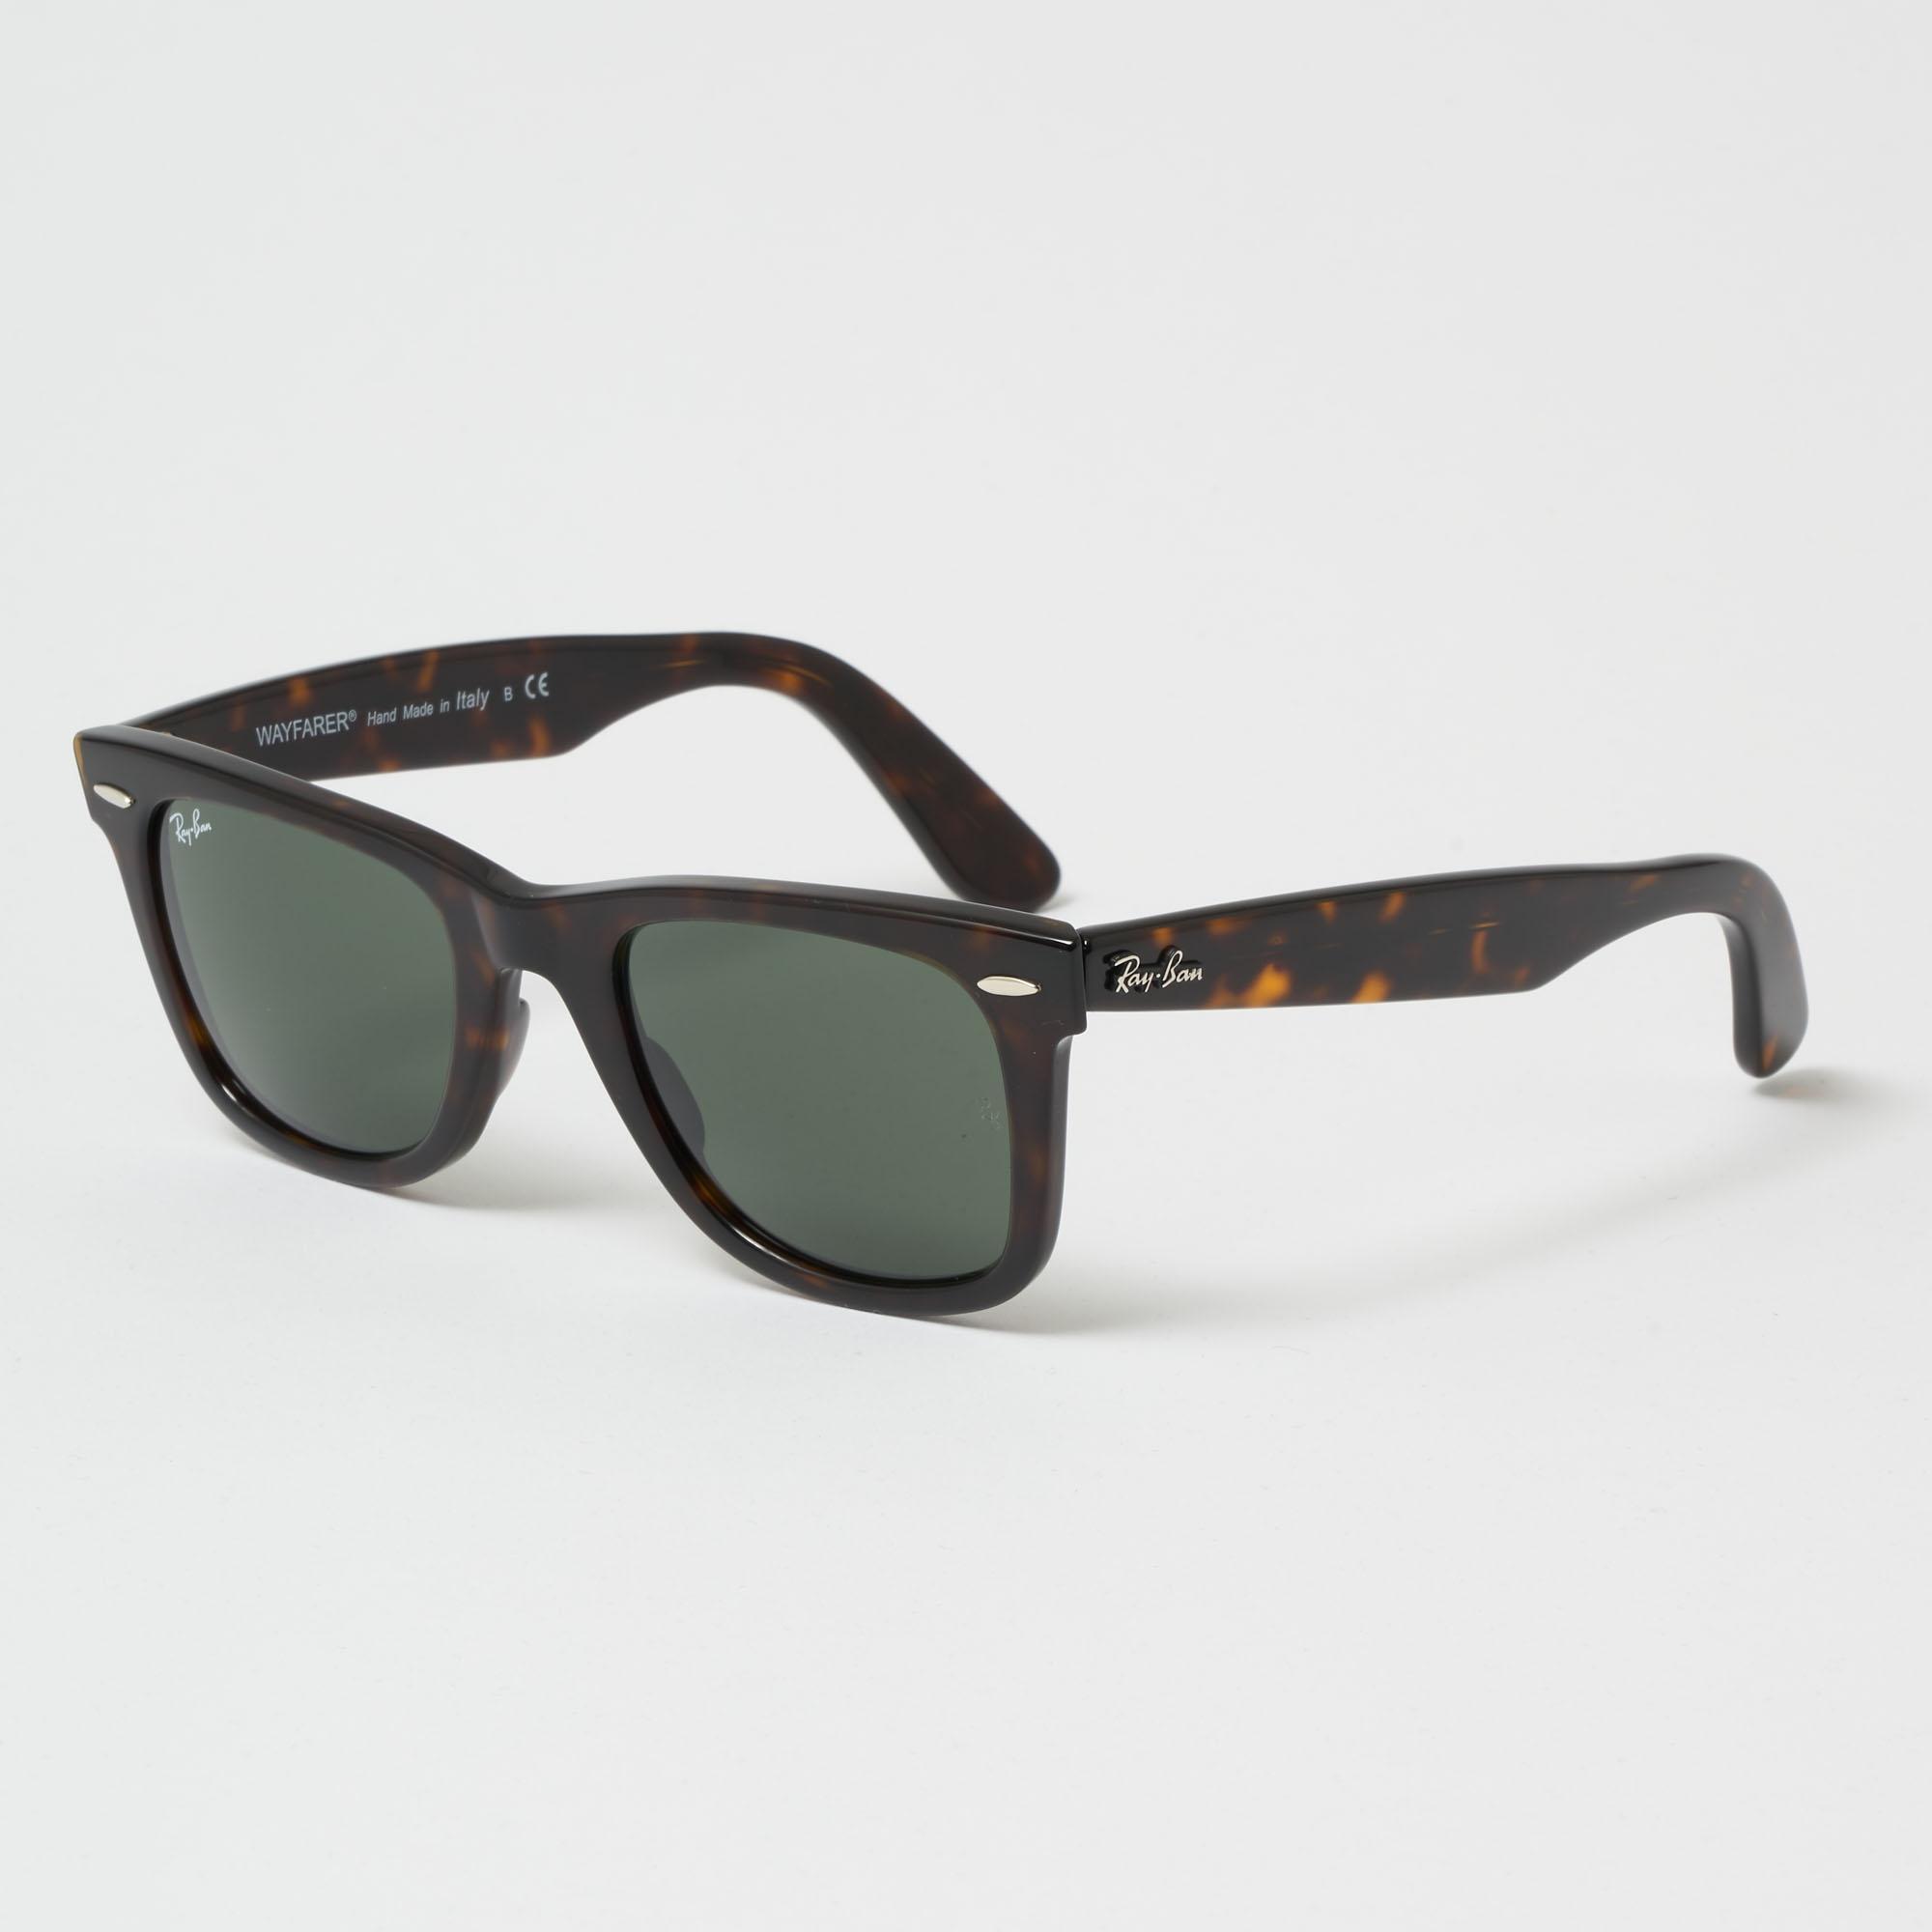 2cc143baaca ... netherlands ray ban. mens tortoise original wayfarer classic sunglasses  green classic g 15 lenses babb0